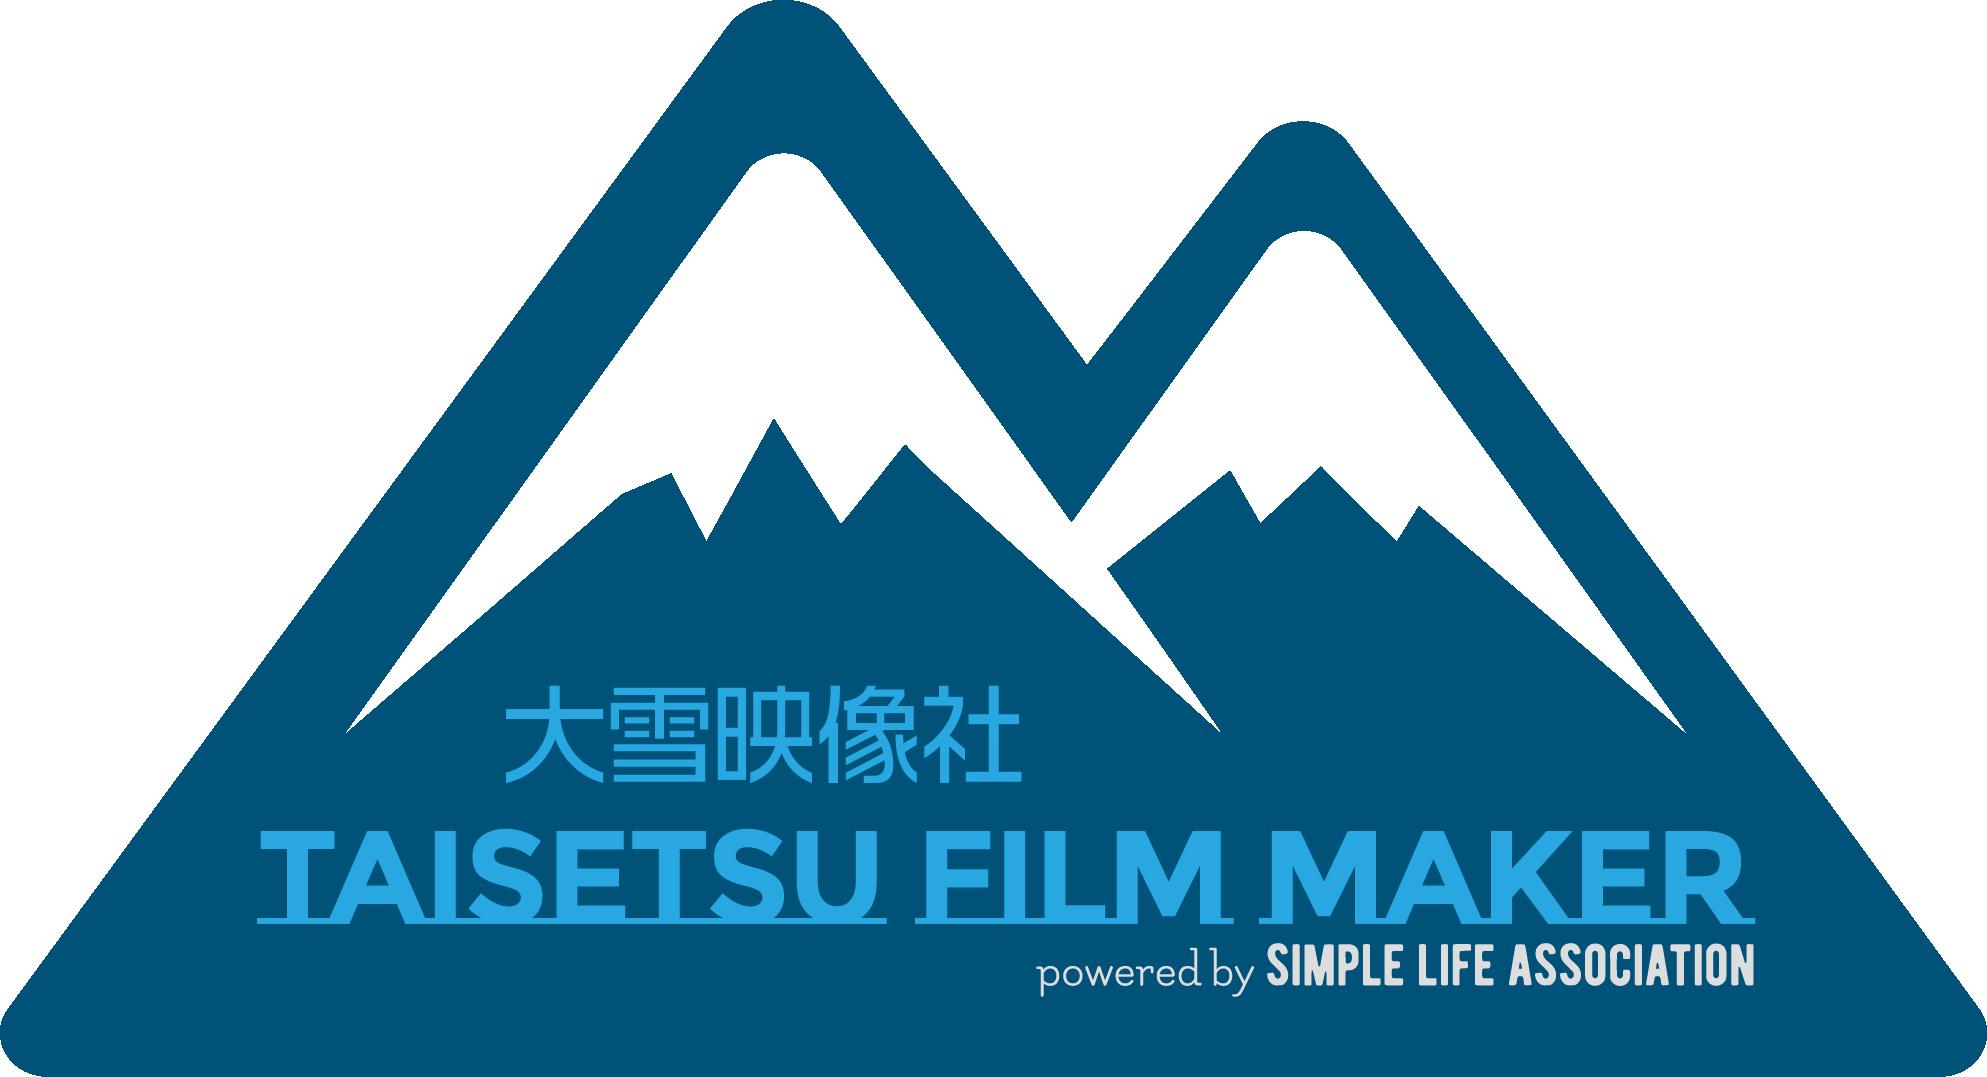 taisetsu film maker